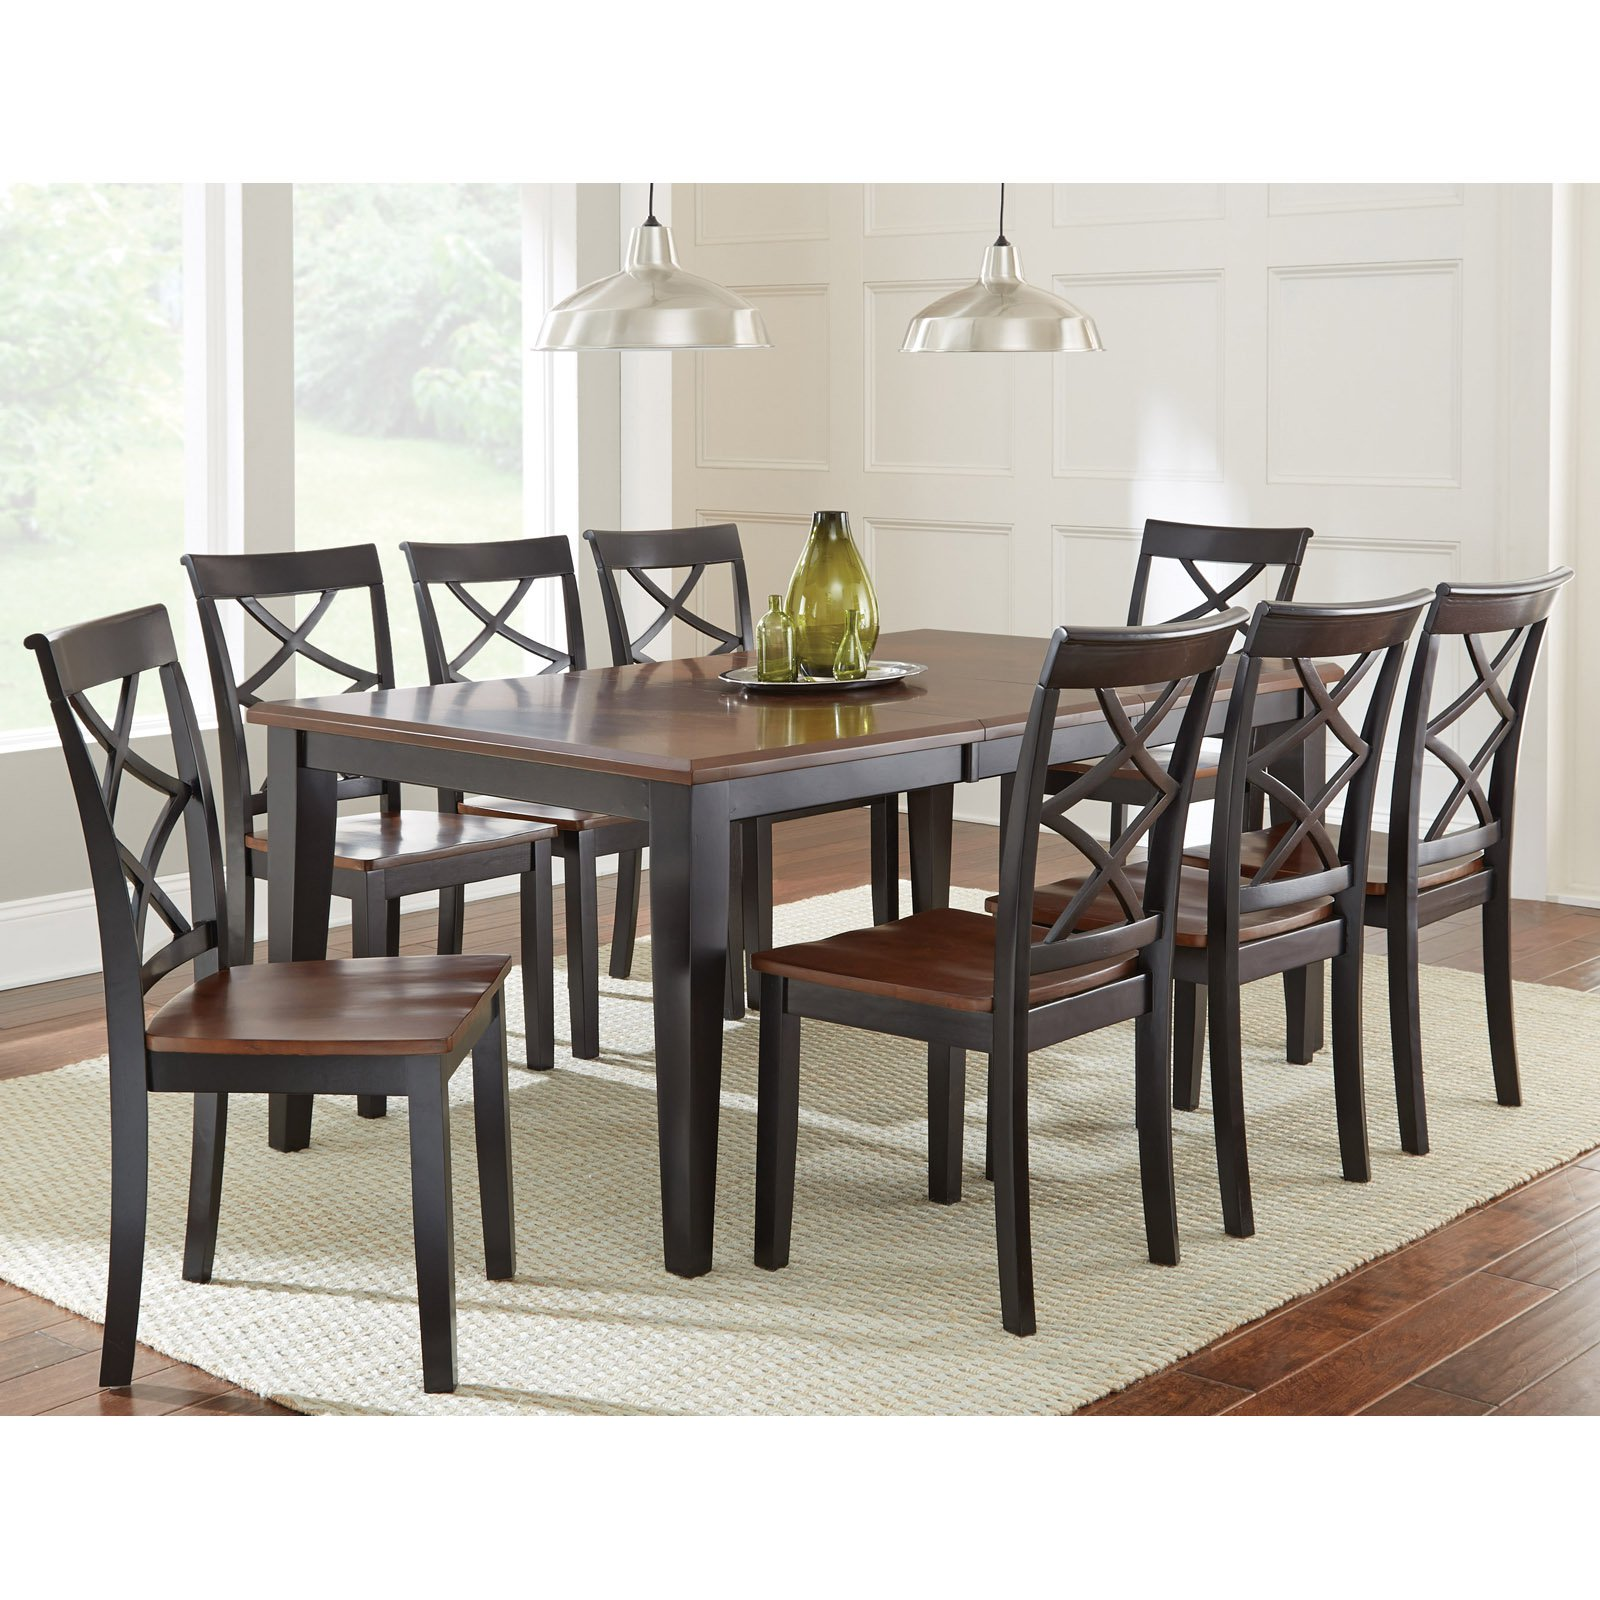 Steve Silver Rani 9 Piece Dining Table Set